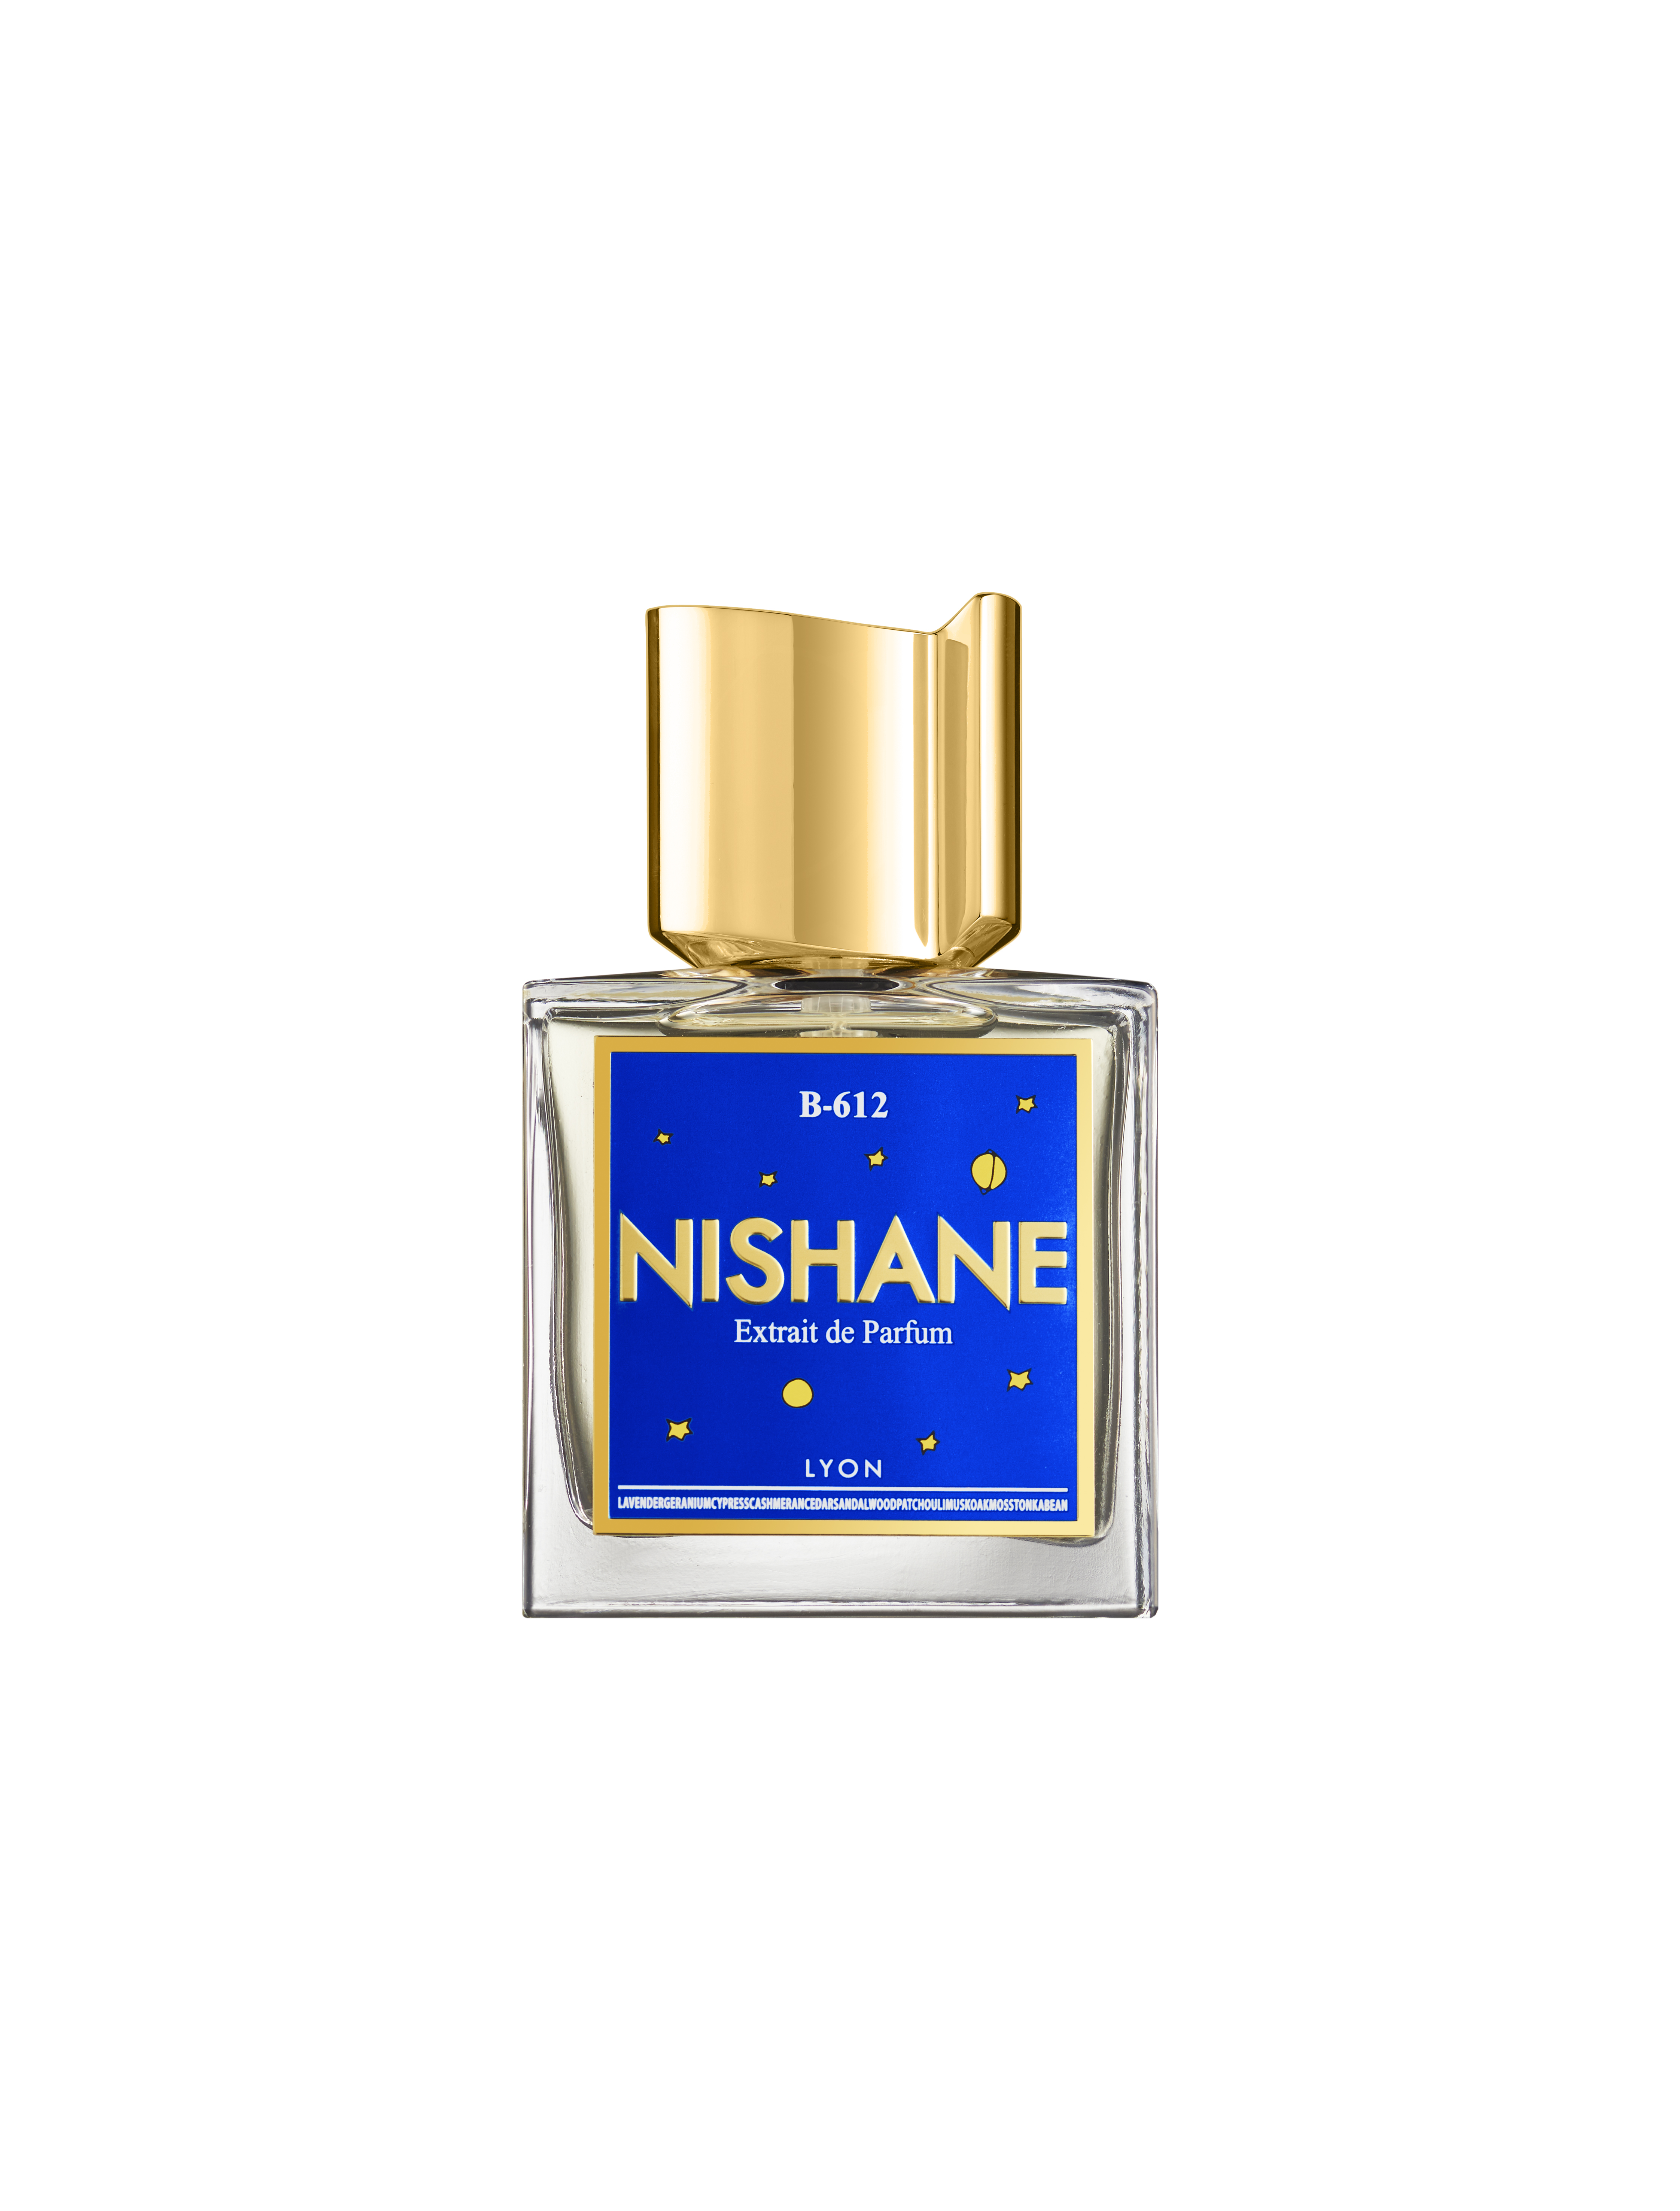 Nishane - B-612 - Extrait de Parfum 50 ml